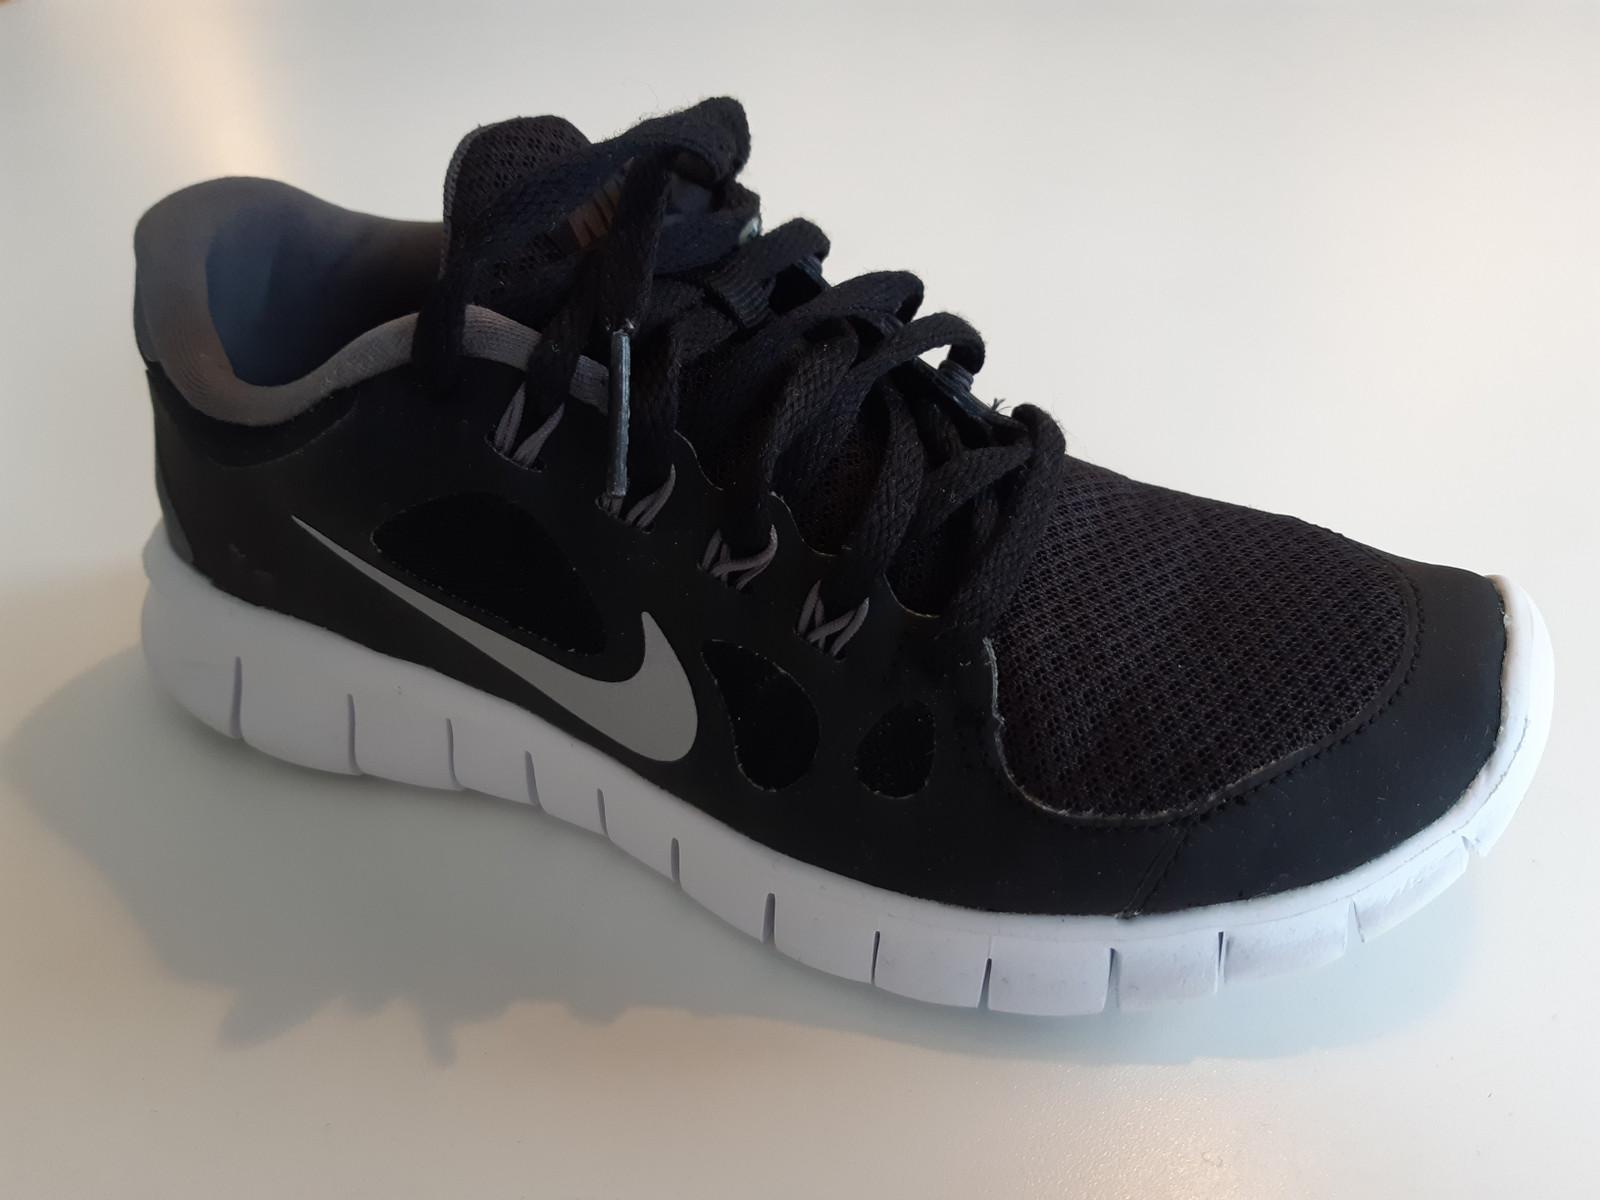 Nike Free Sko Vaskemaskine